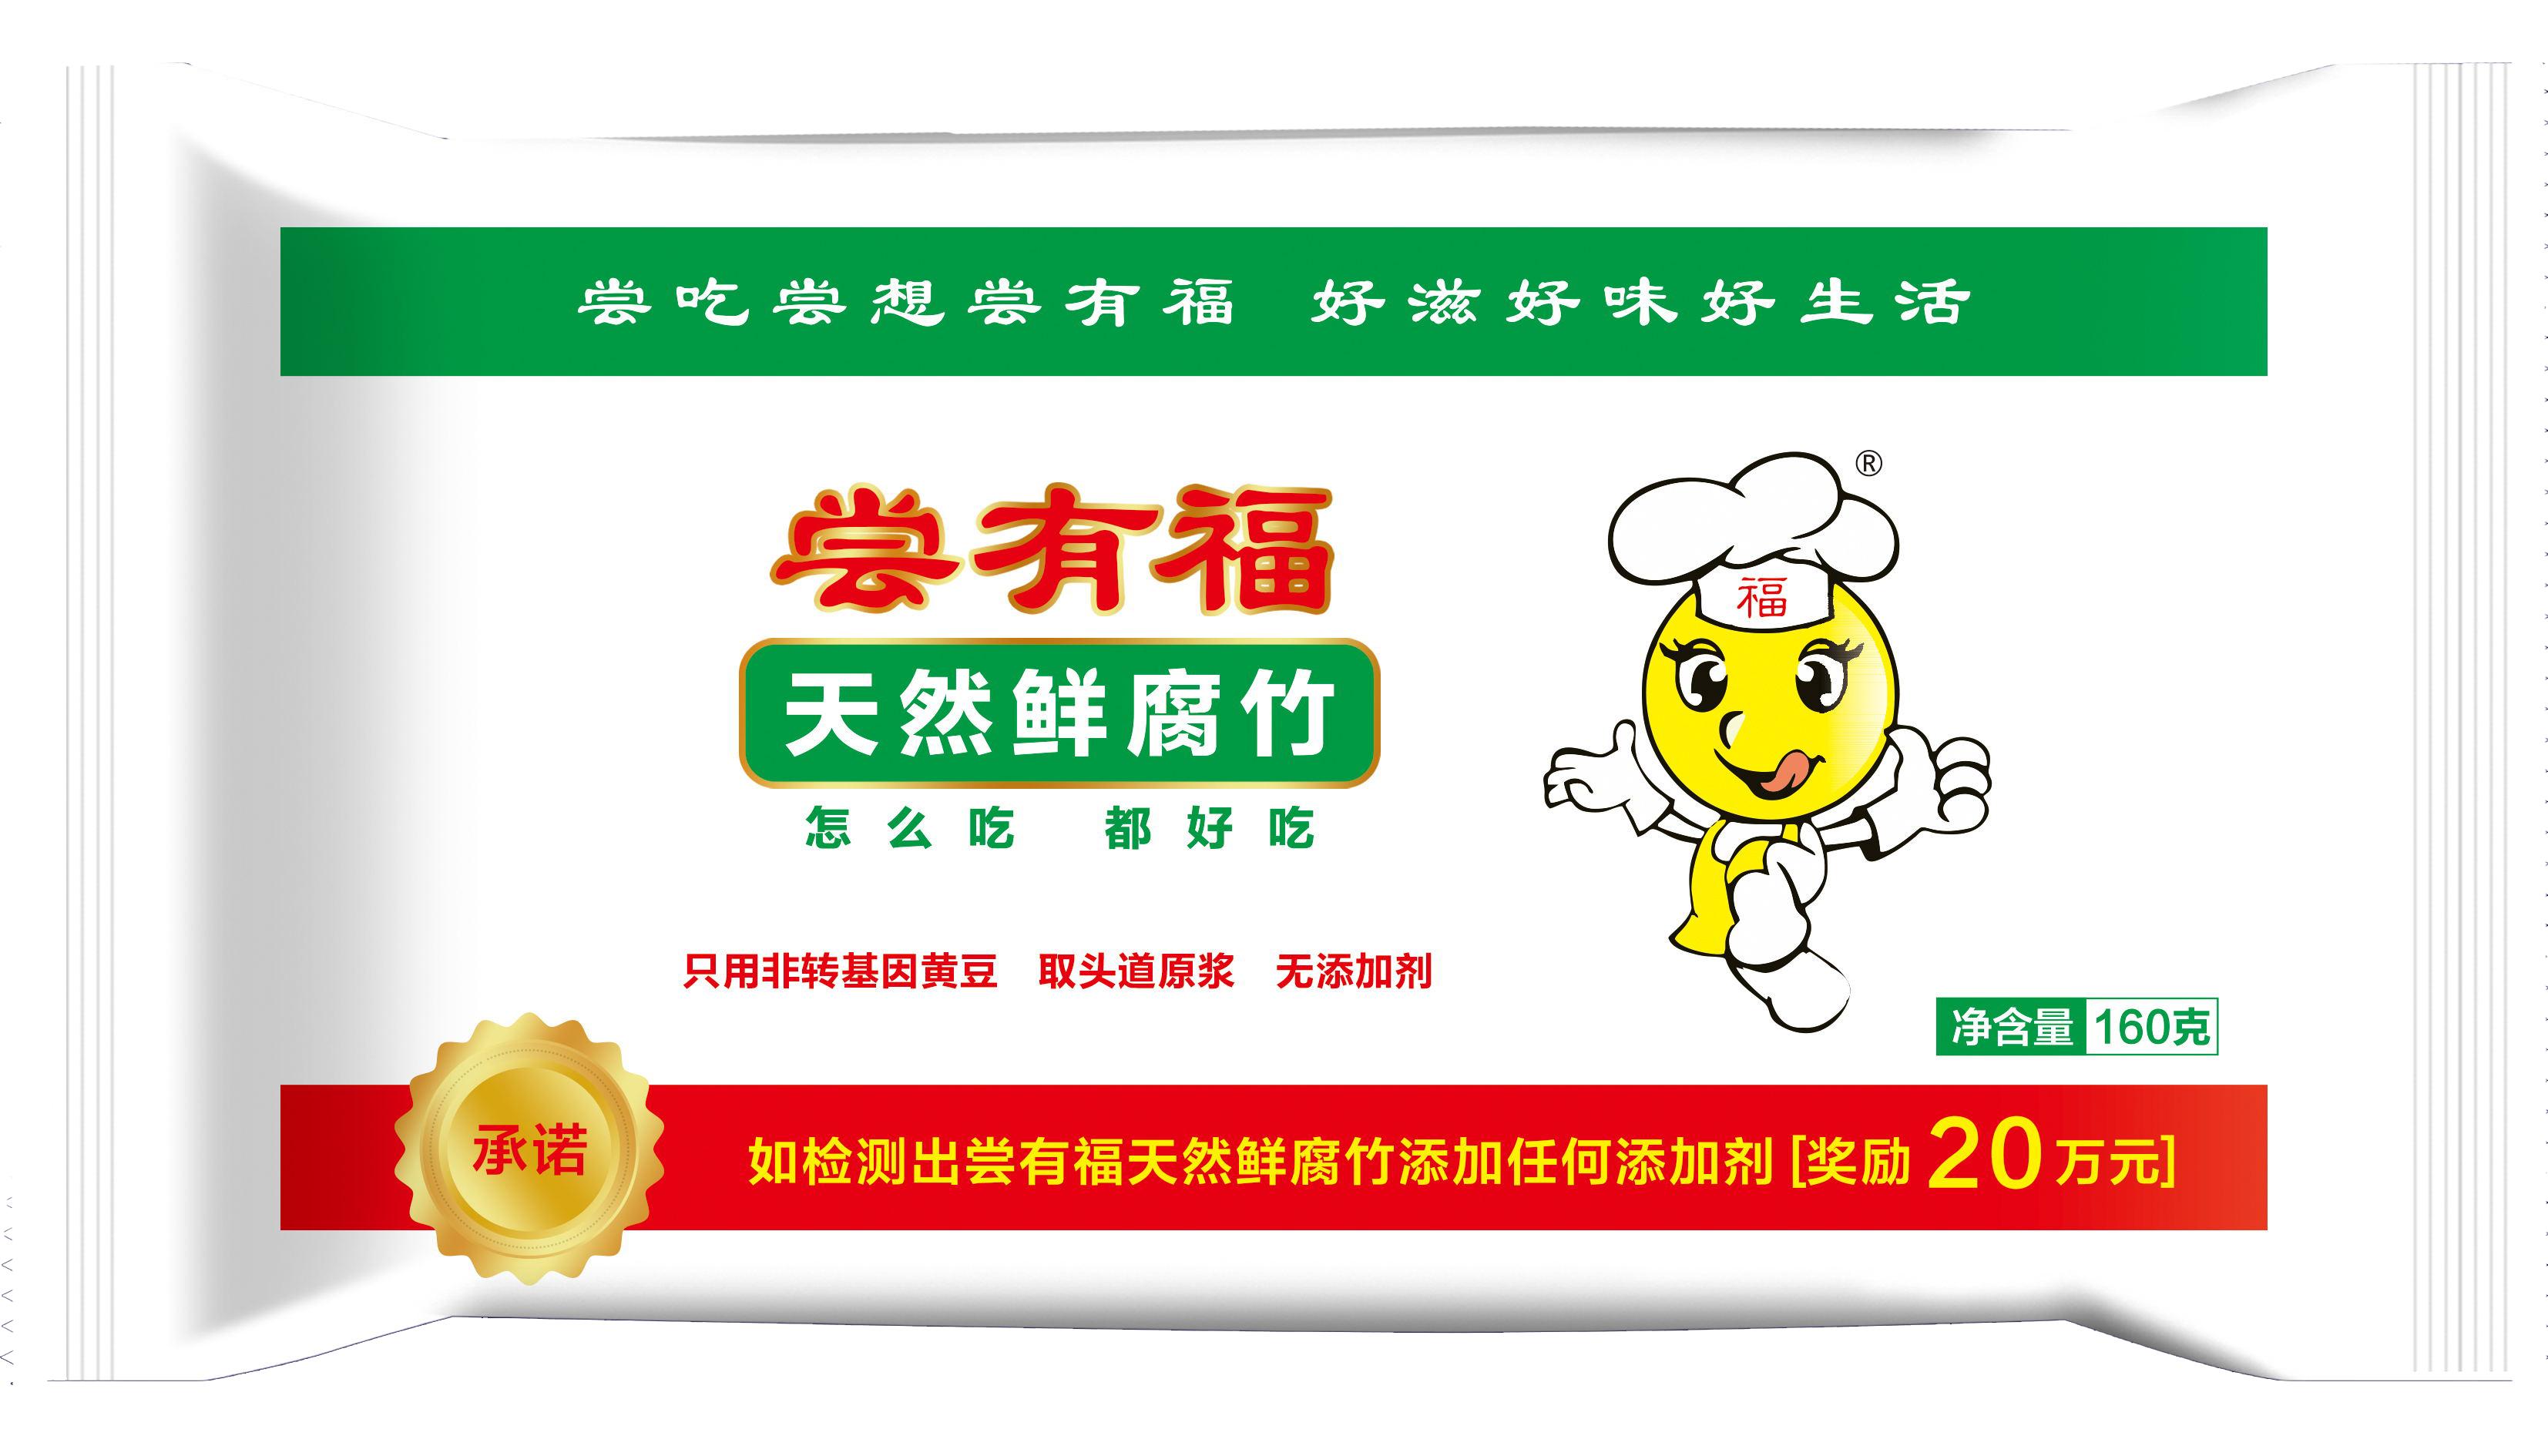 尝有福高蛋白豆油皮